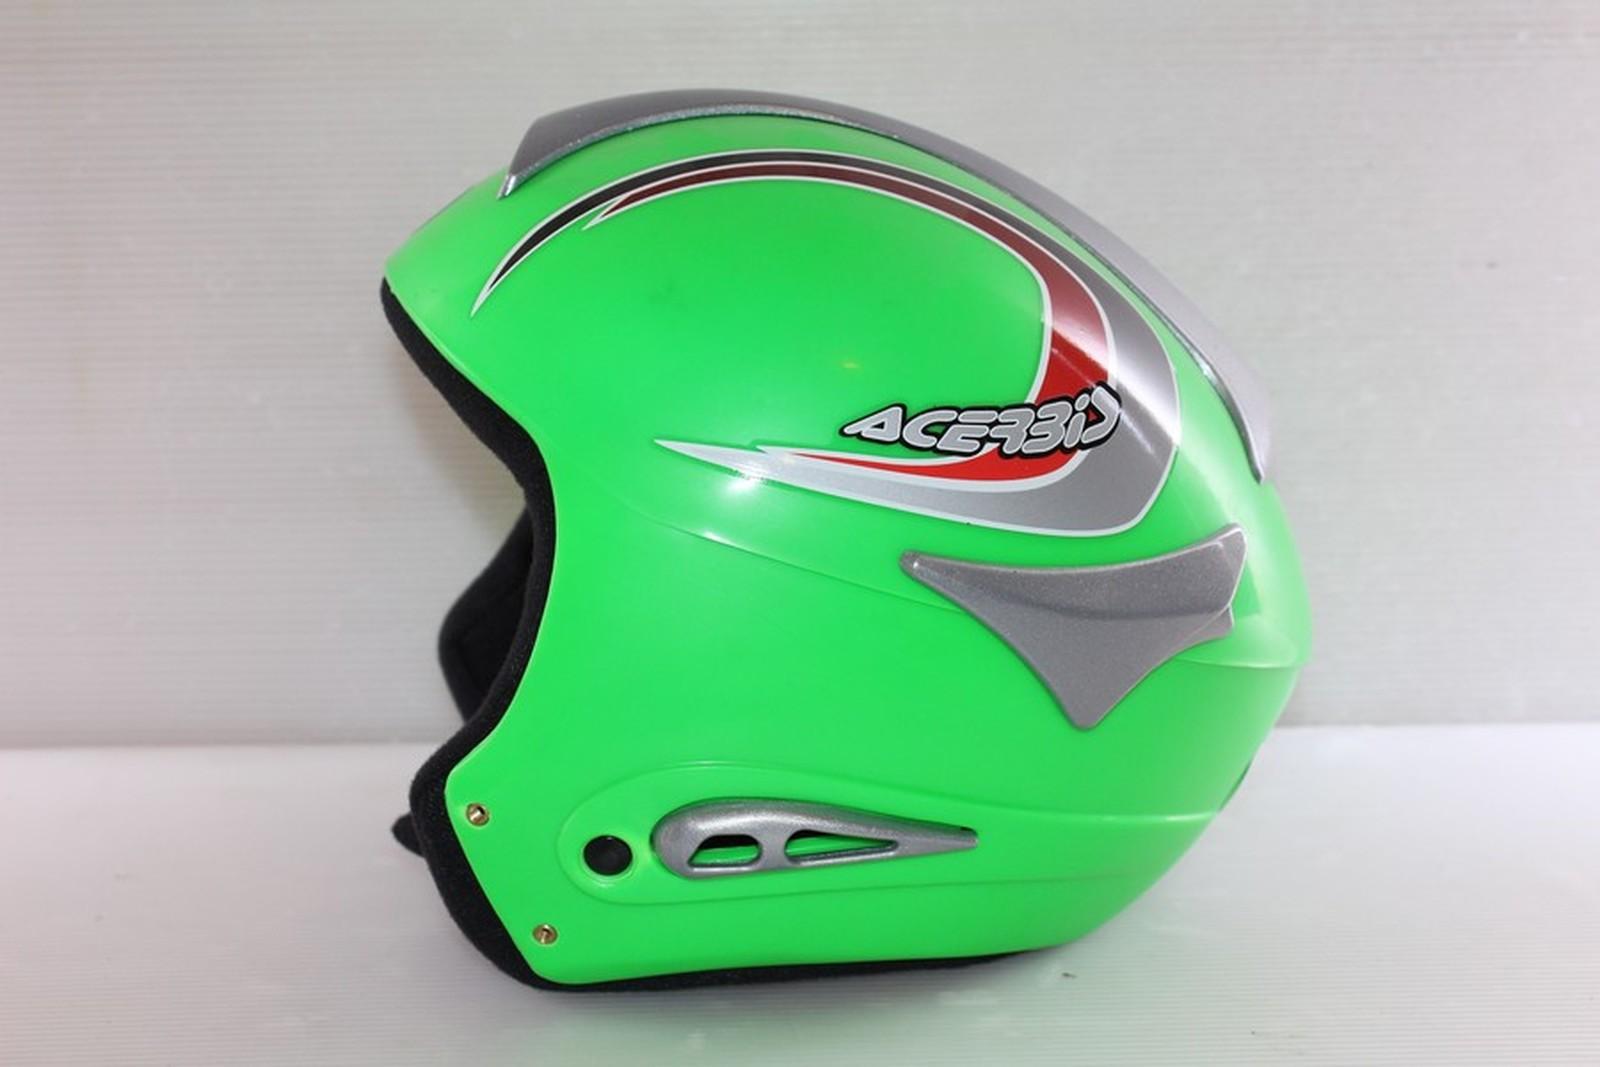 Lyžařská helma Acerbis Green vel. 58